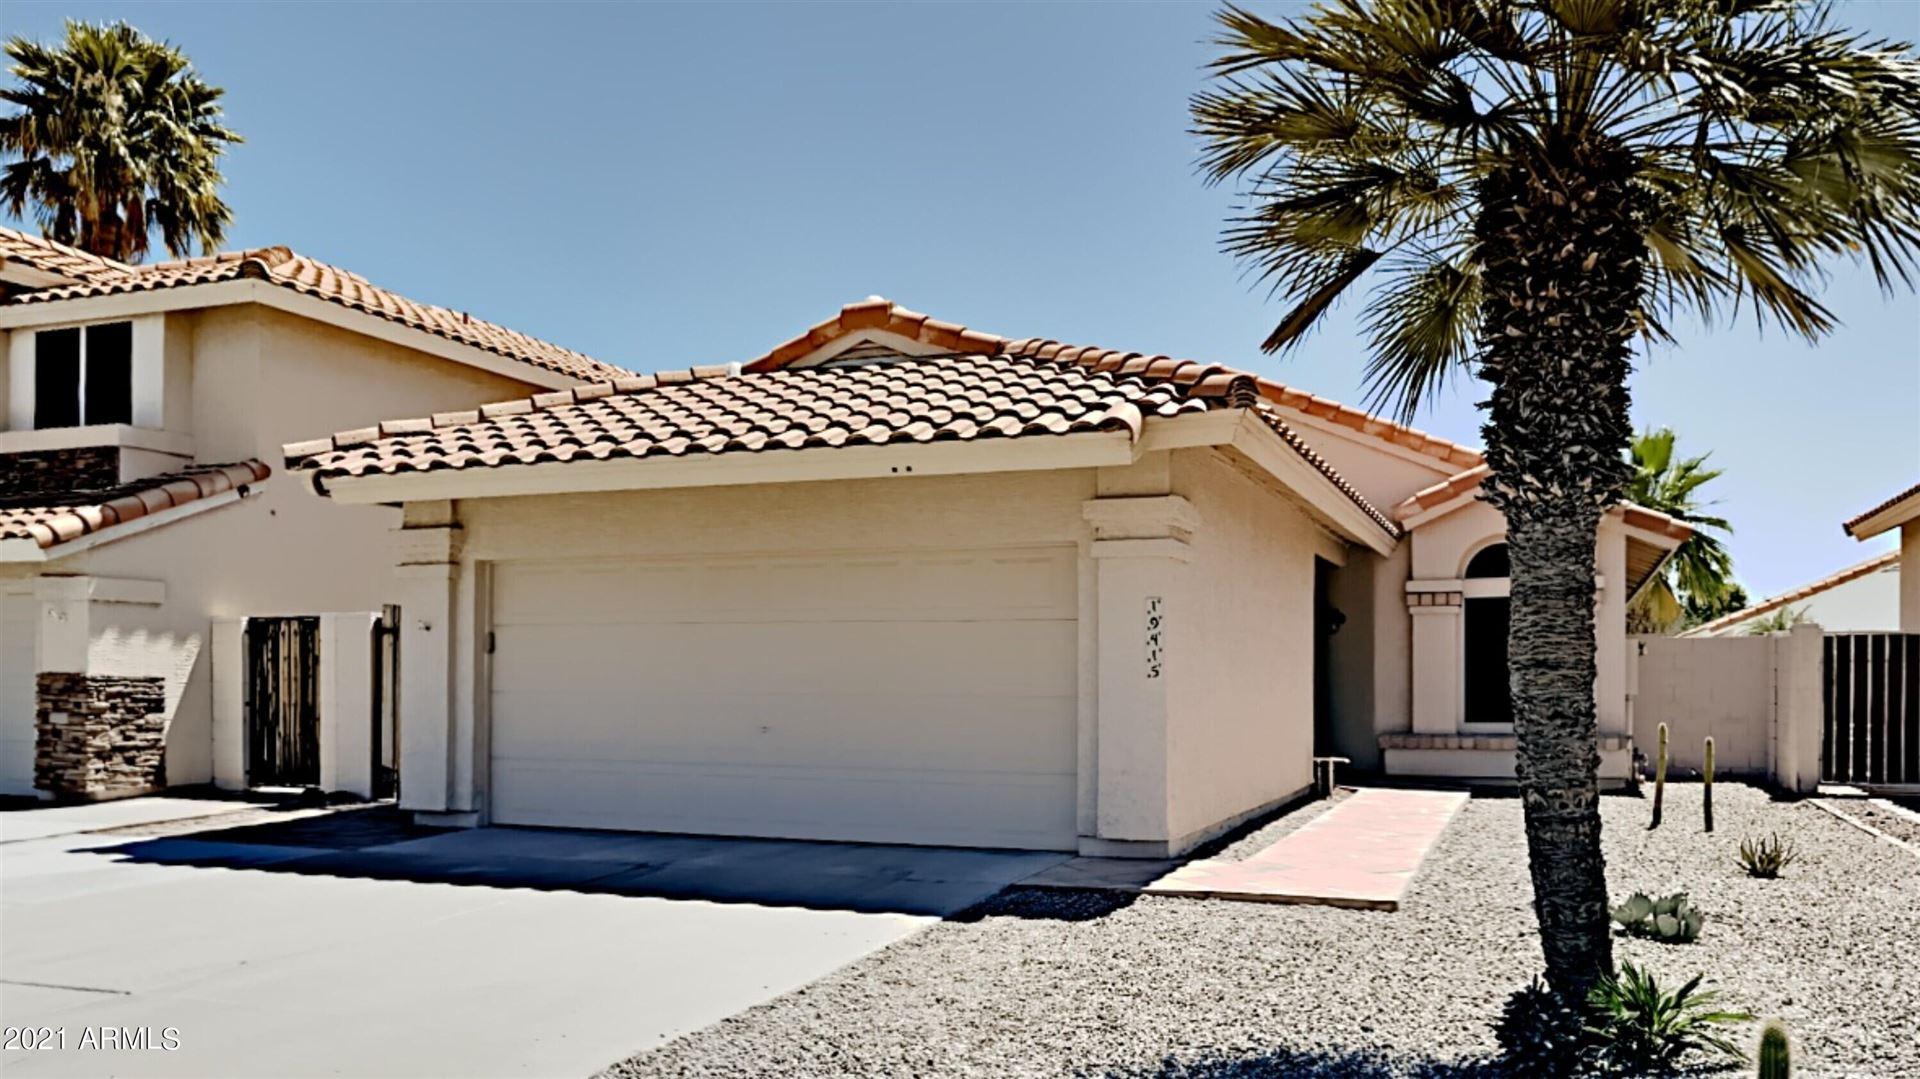 19415 N 77TH Avenue, Glendale, AZ 85308 - MLS#: 6243575